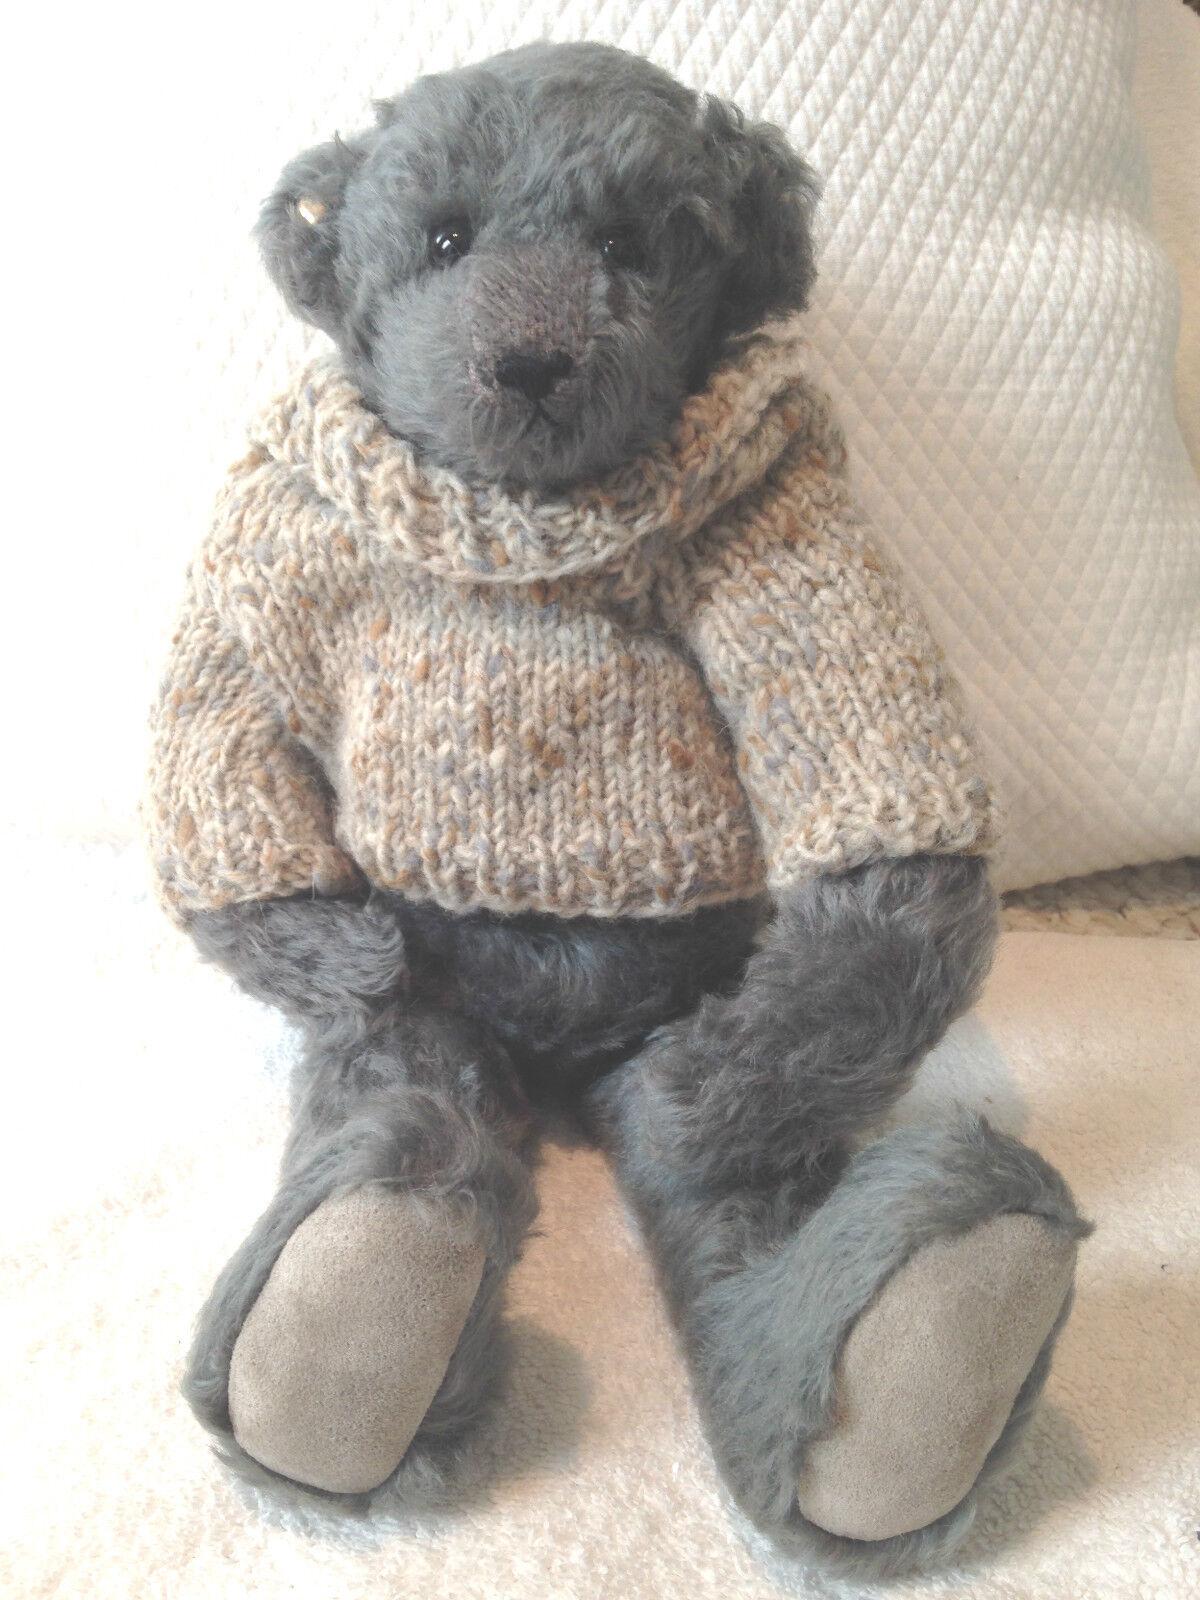 ️McB's BEARS   BARBARA McCONNELL LIMITED EDITION TEDDY BEAR ARTIST ORIGINAL ️